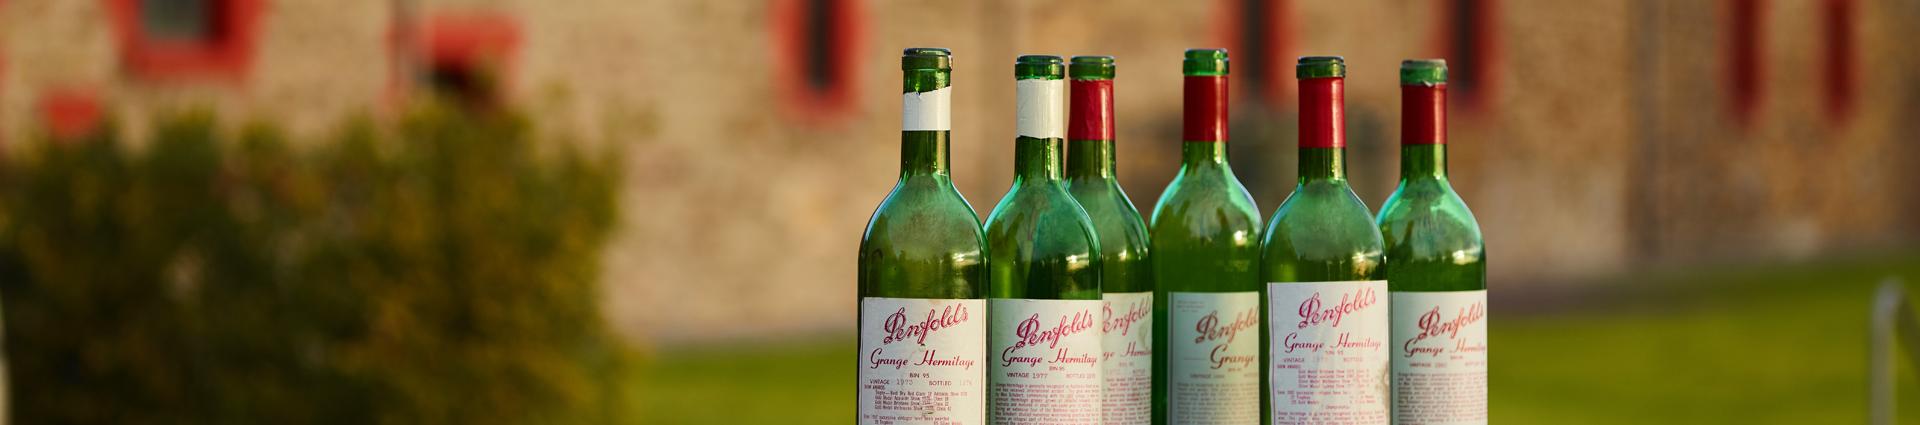 A row of heritage Grange bottles outside. Heritage brick building behind